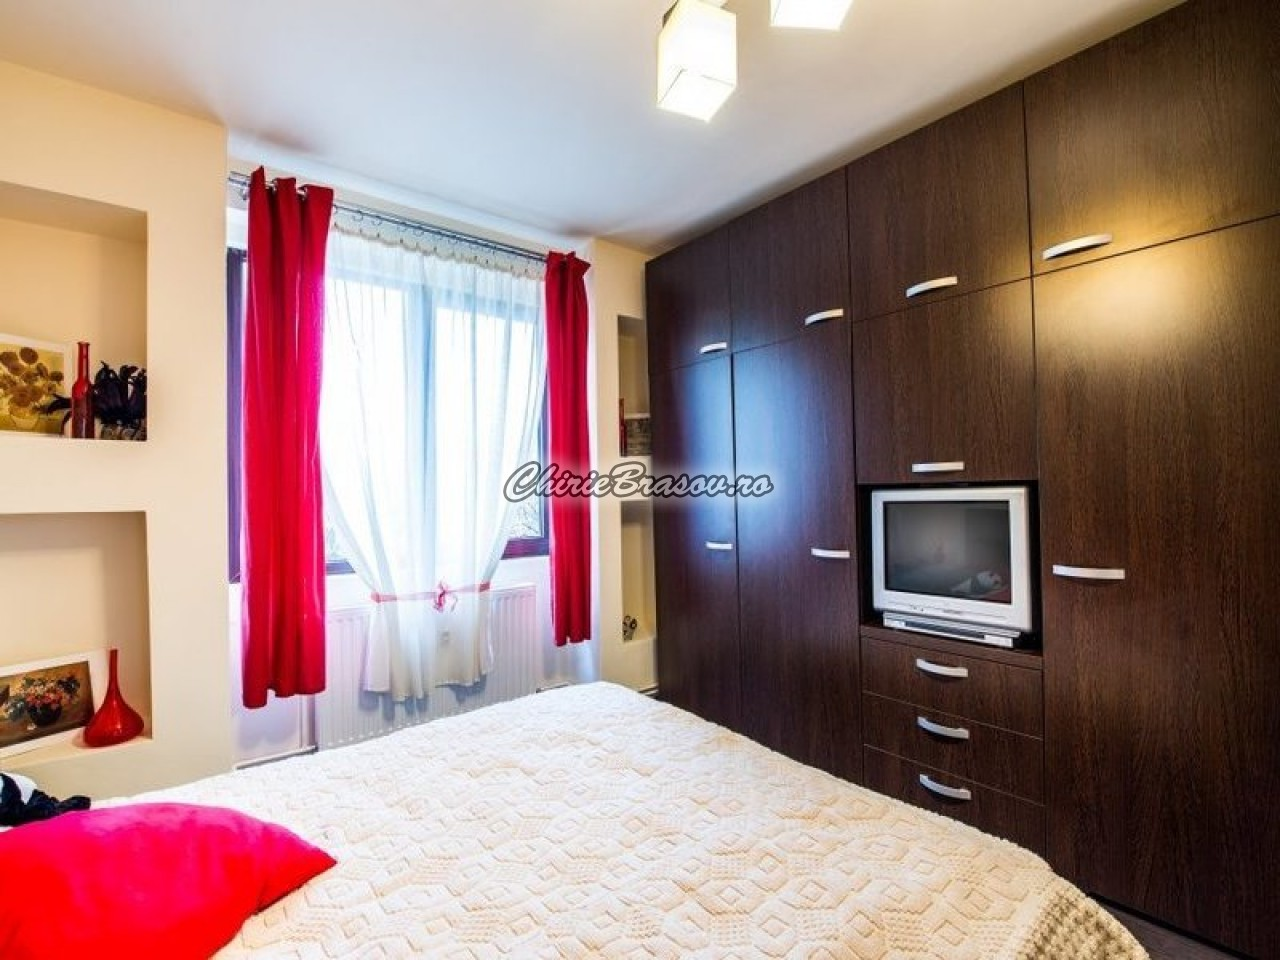 Inchiriere apartament 2 camere Brasov , Central - Grivitei-353-0